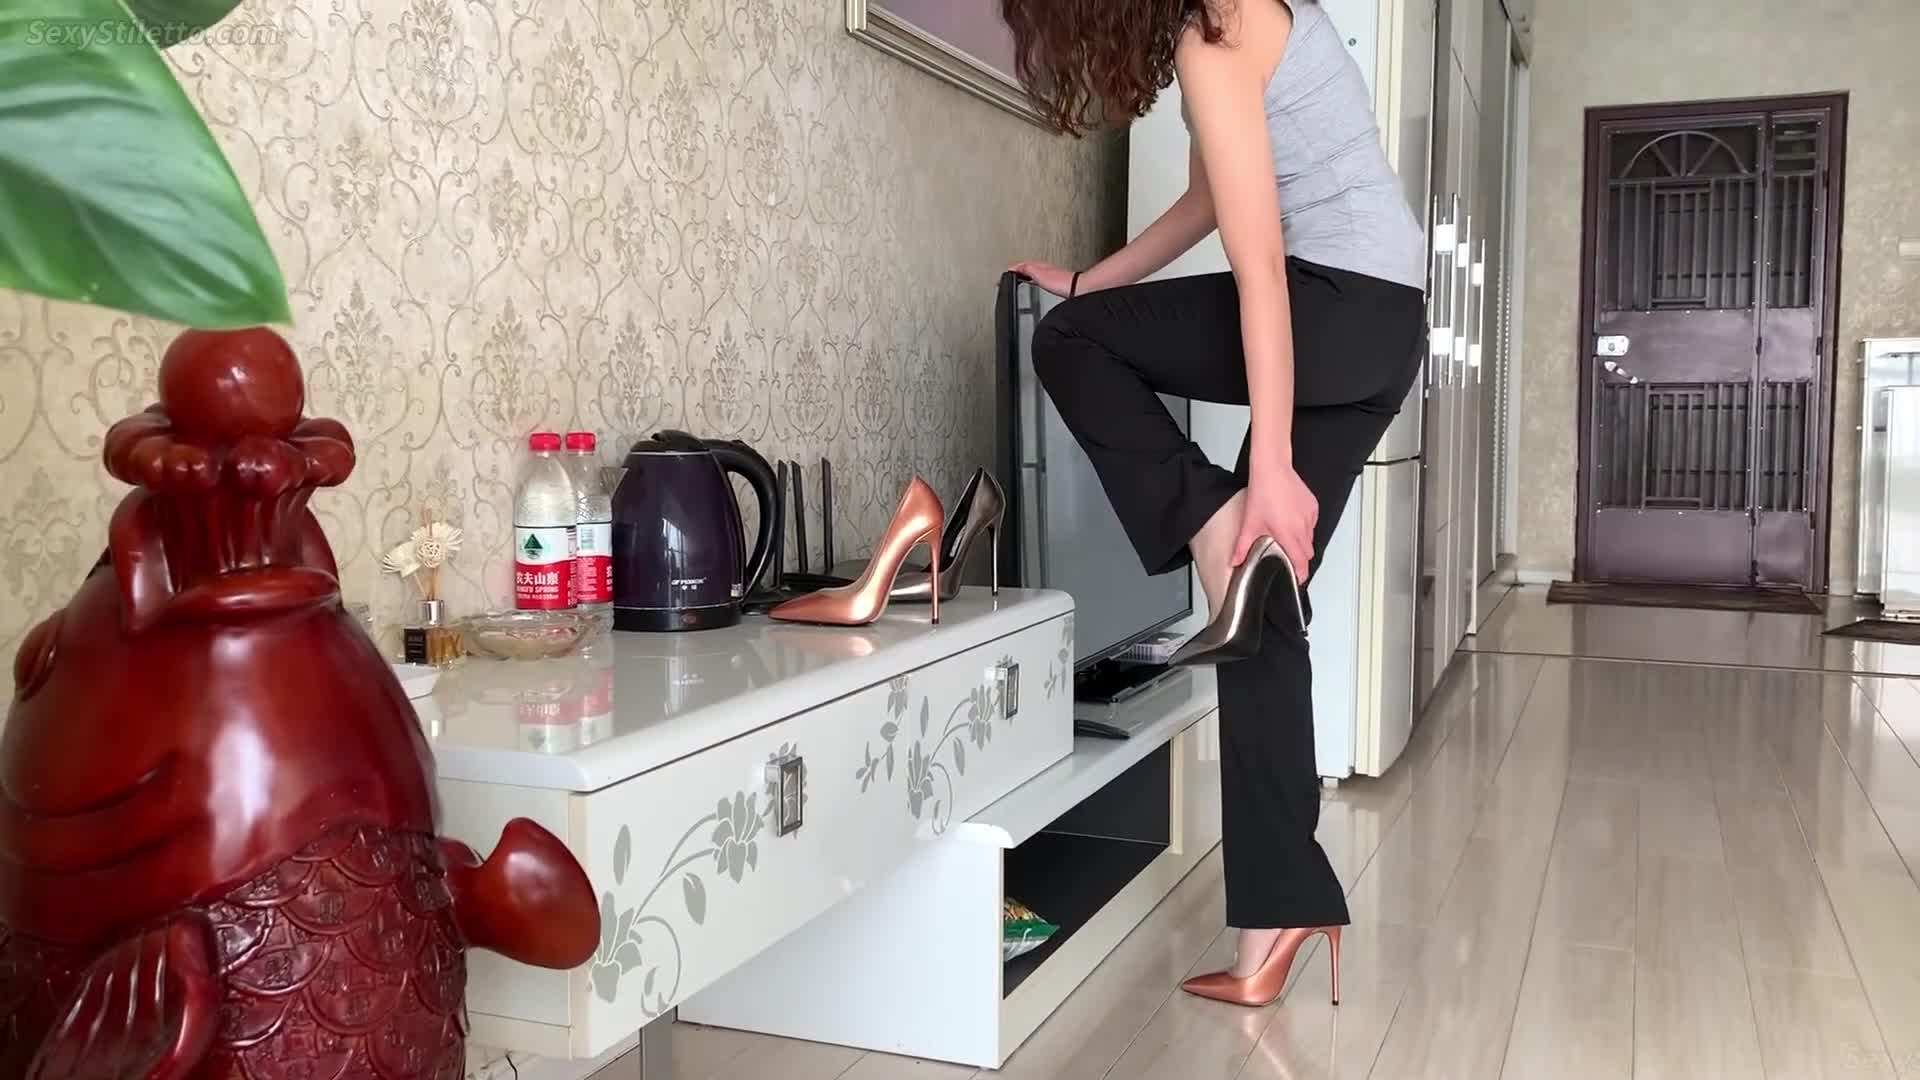 Sexy High Heels   Sexy Stiletto   Women in Heels   Women in Pantyhose   Part 103